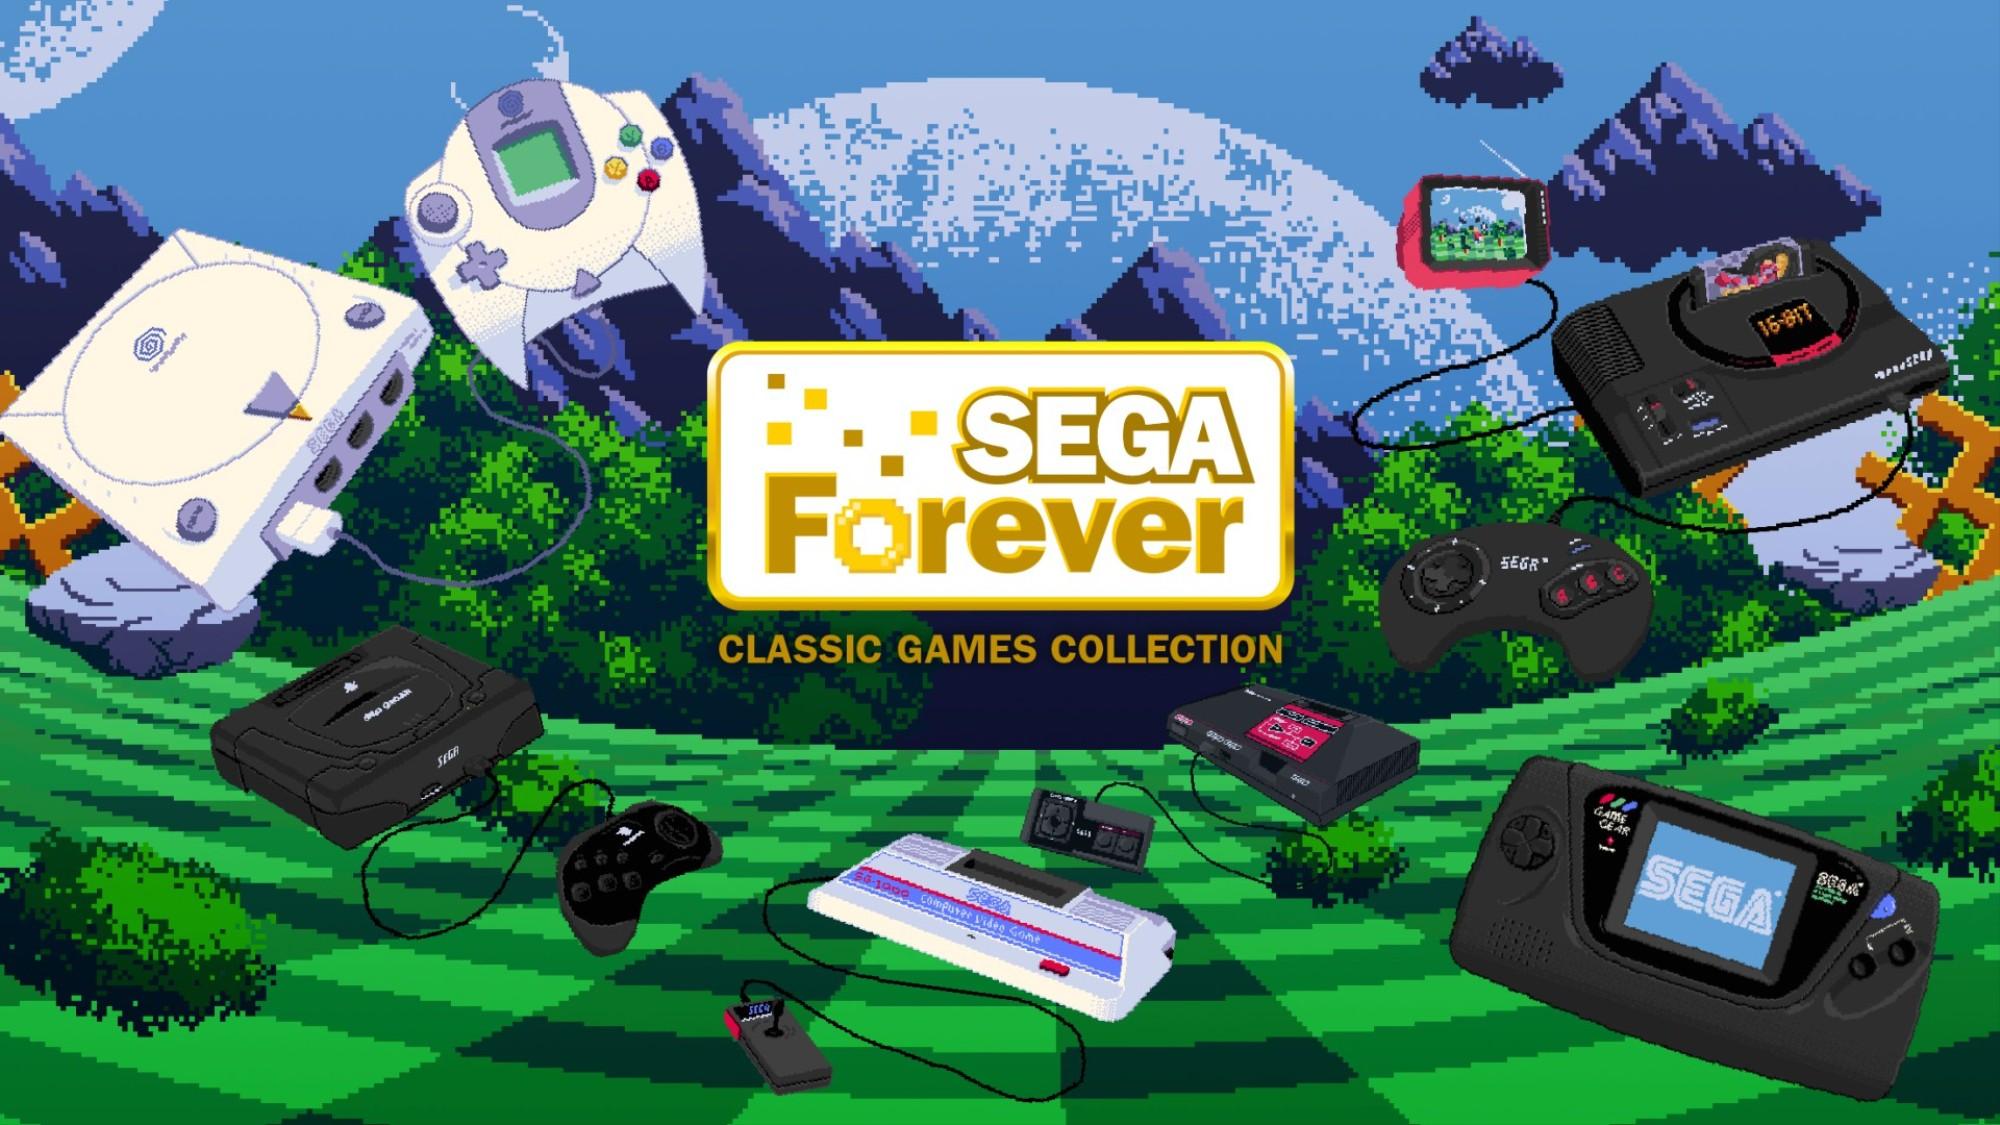 Sega Forever's Shoddy Ports Leave Sega on the Defensive